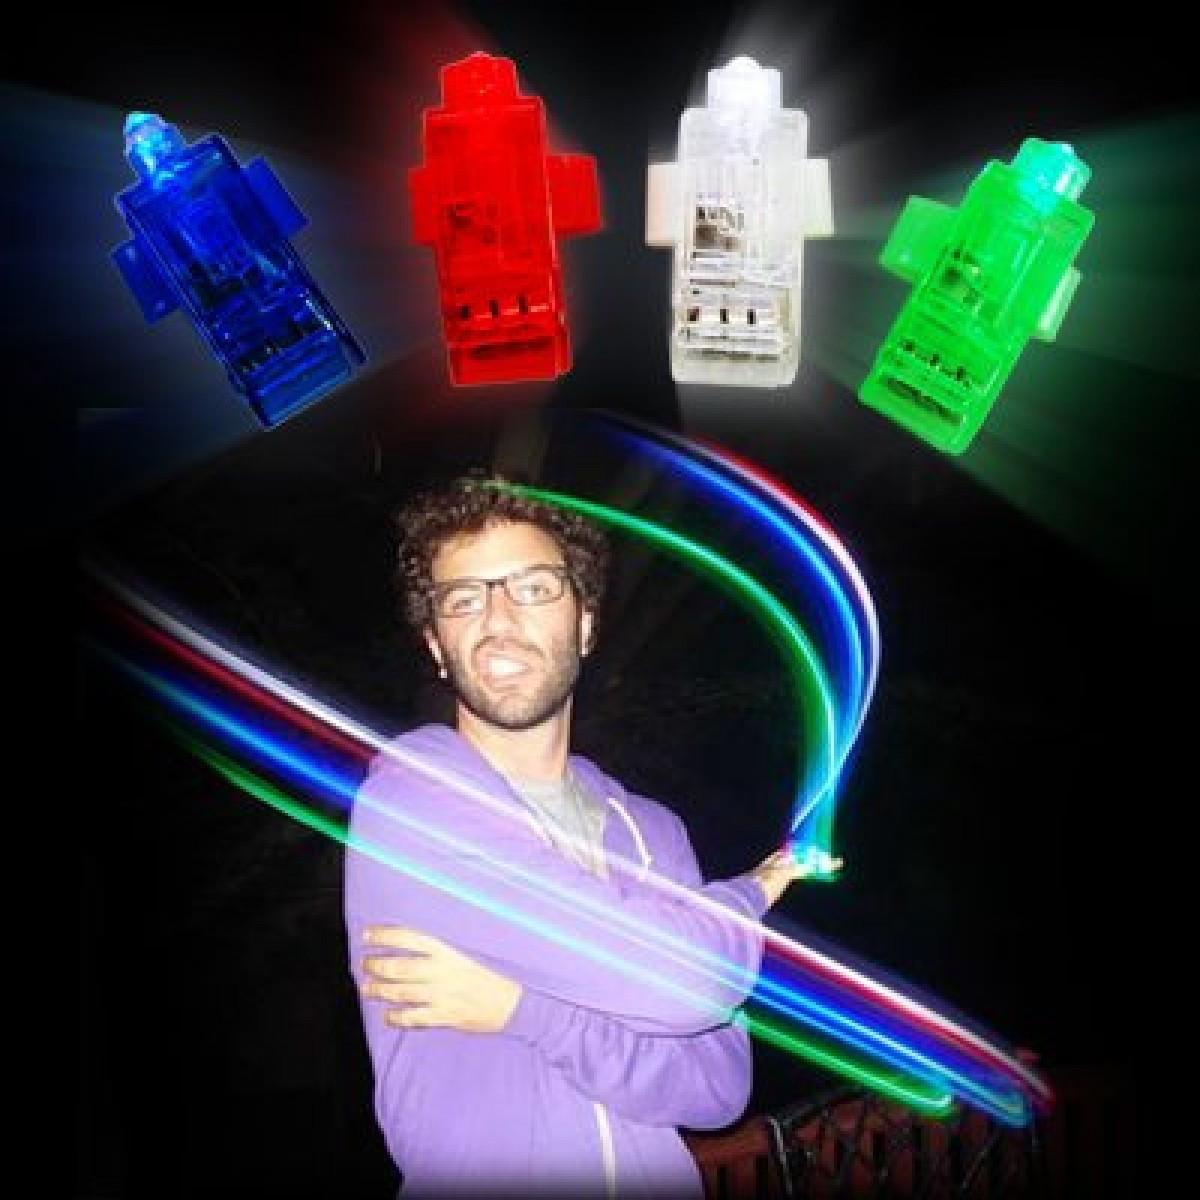 "Підсвітка пальців Laser Finger, насадки / Подсветка пальцев - Laser Finger (проектор Лазер Фингер) - Інтернет-магазин ""BIGTORG"" в Тернопольской области"